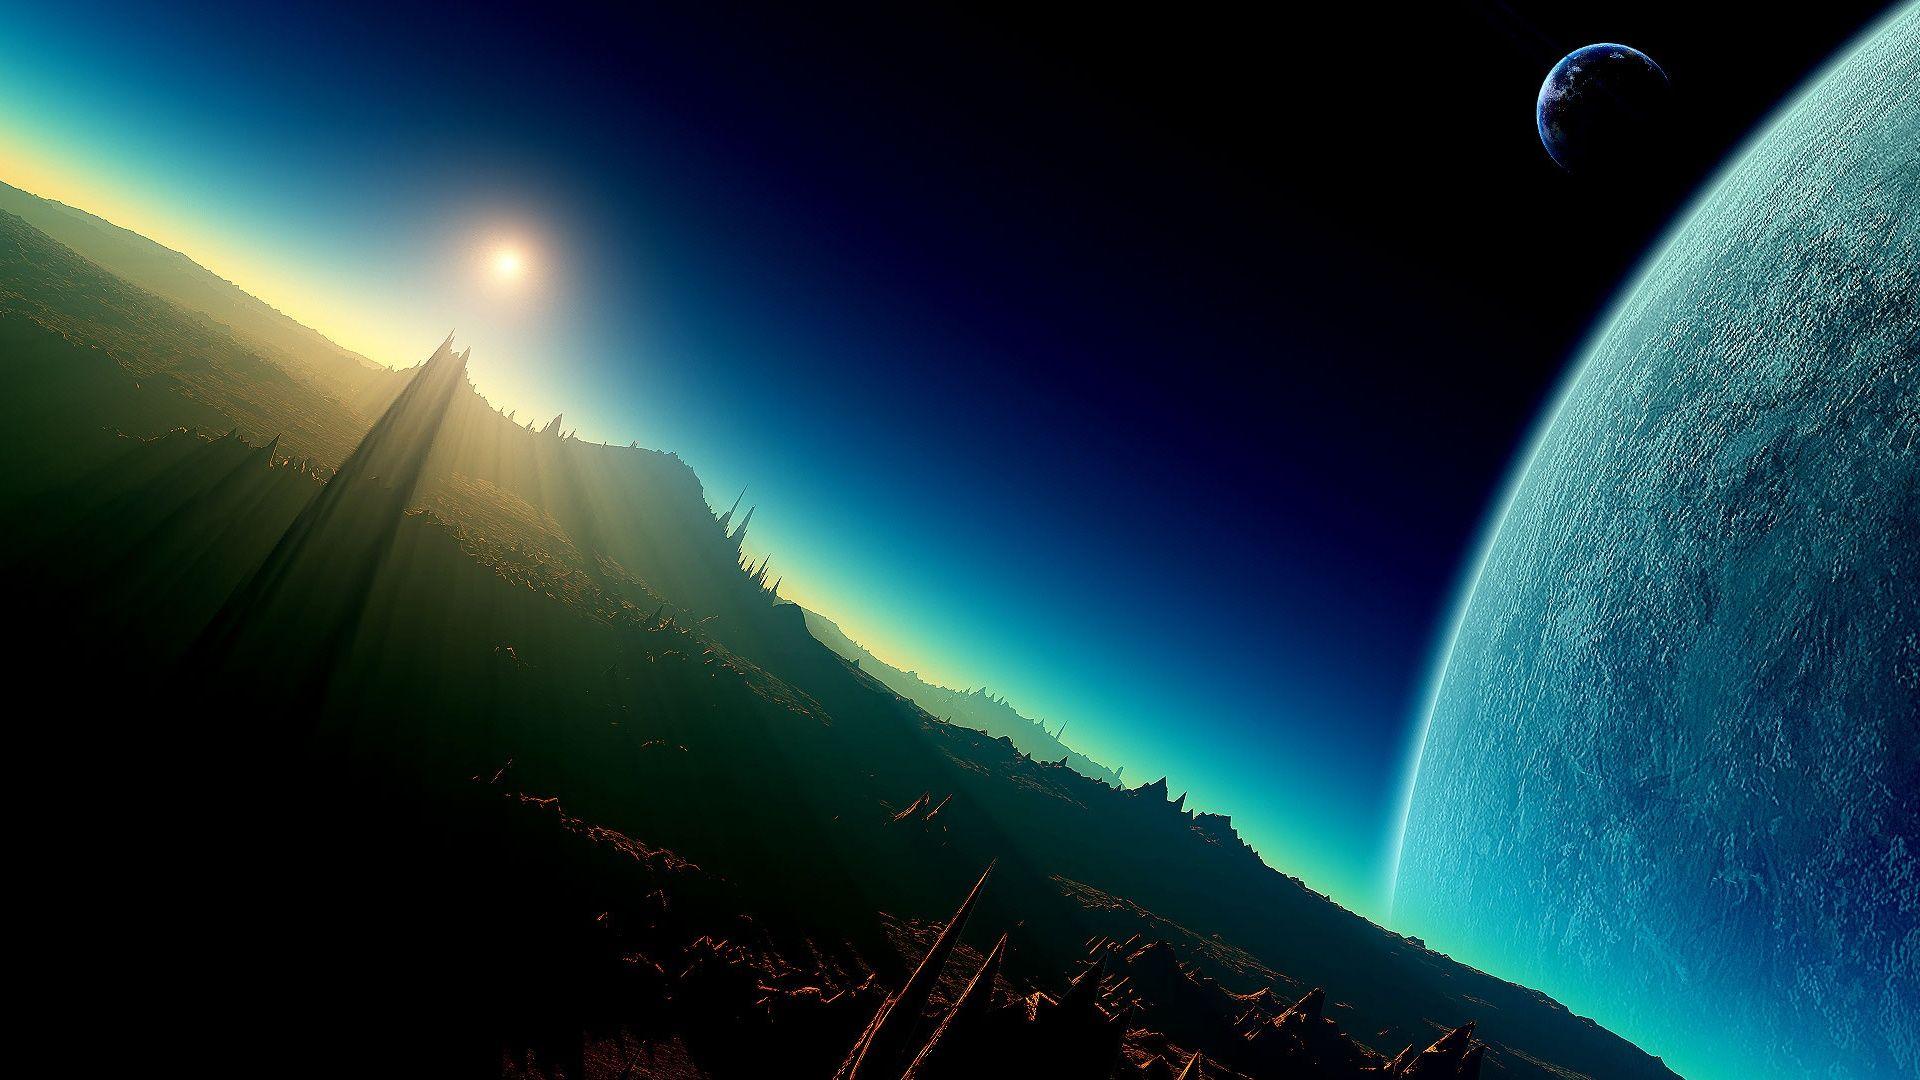 Sci Fi 1080p Background Picture Image 1920x1080